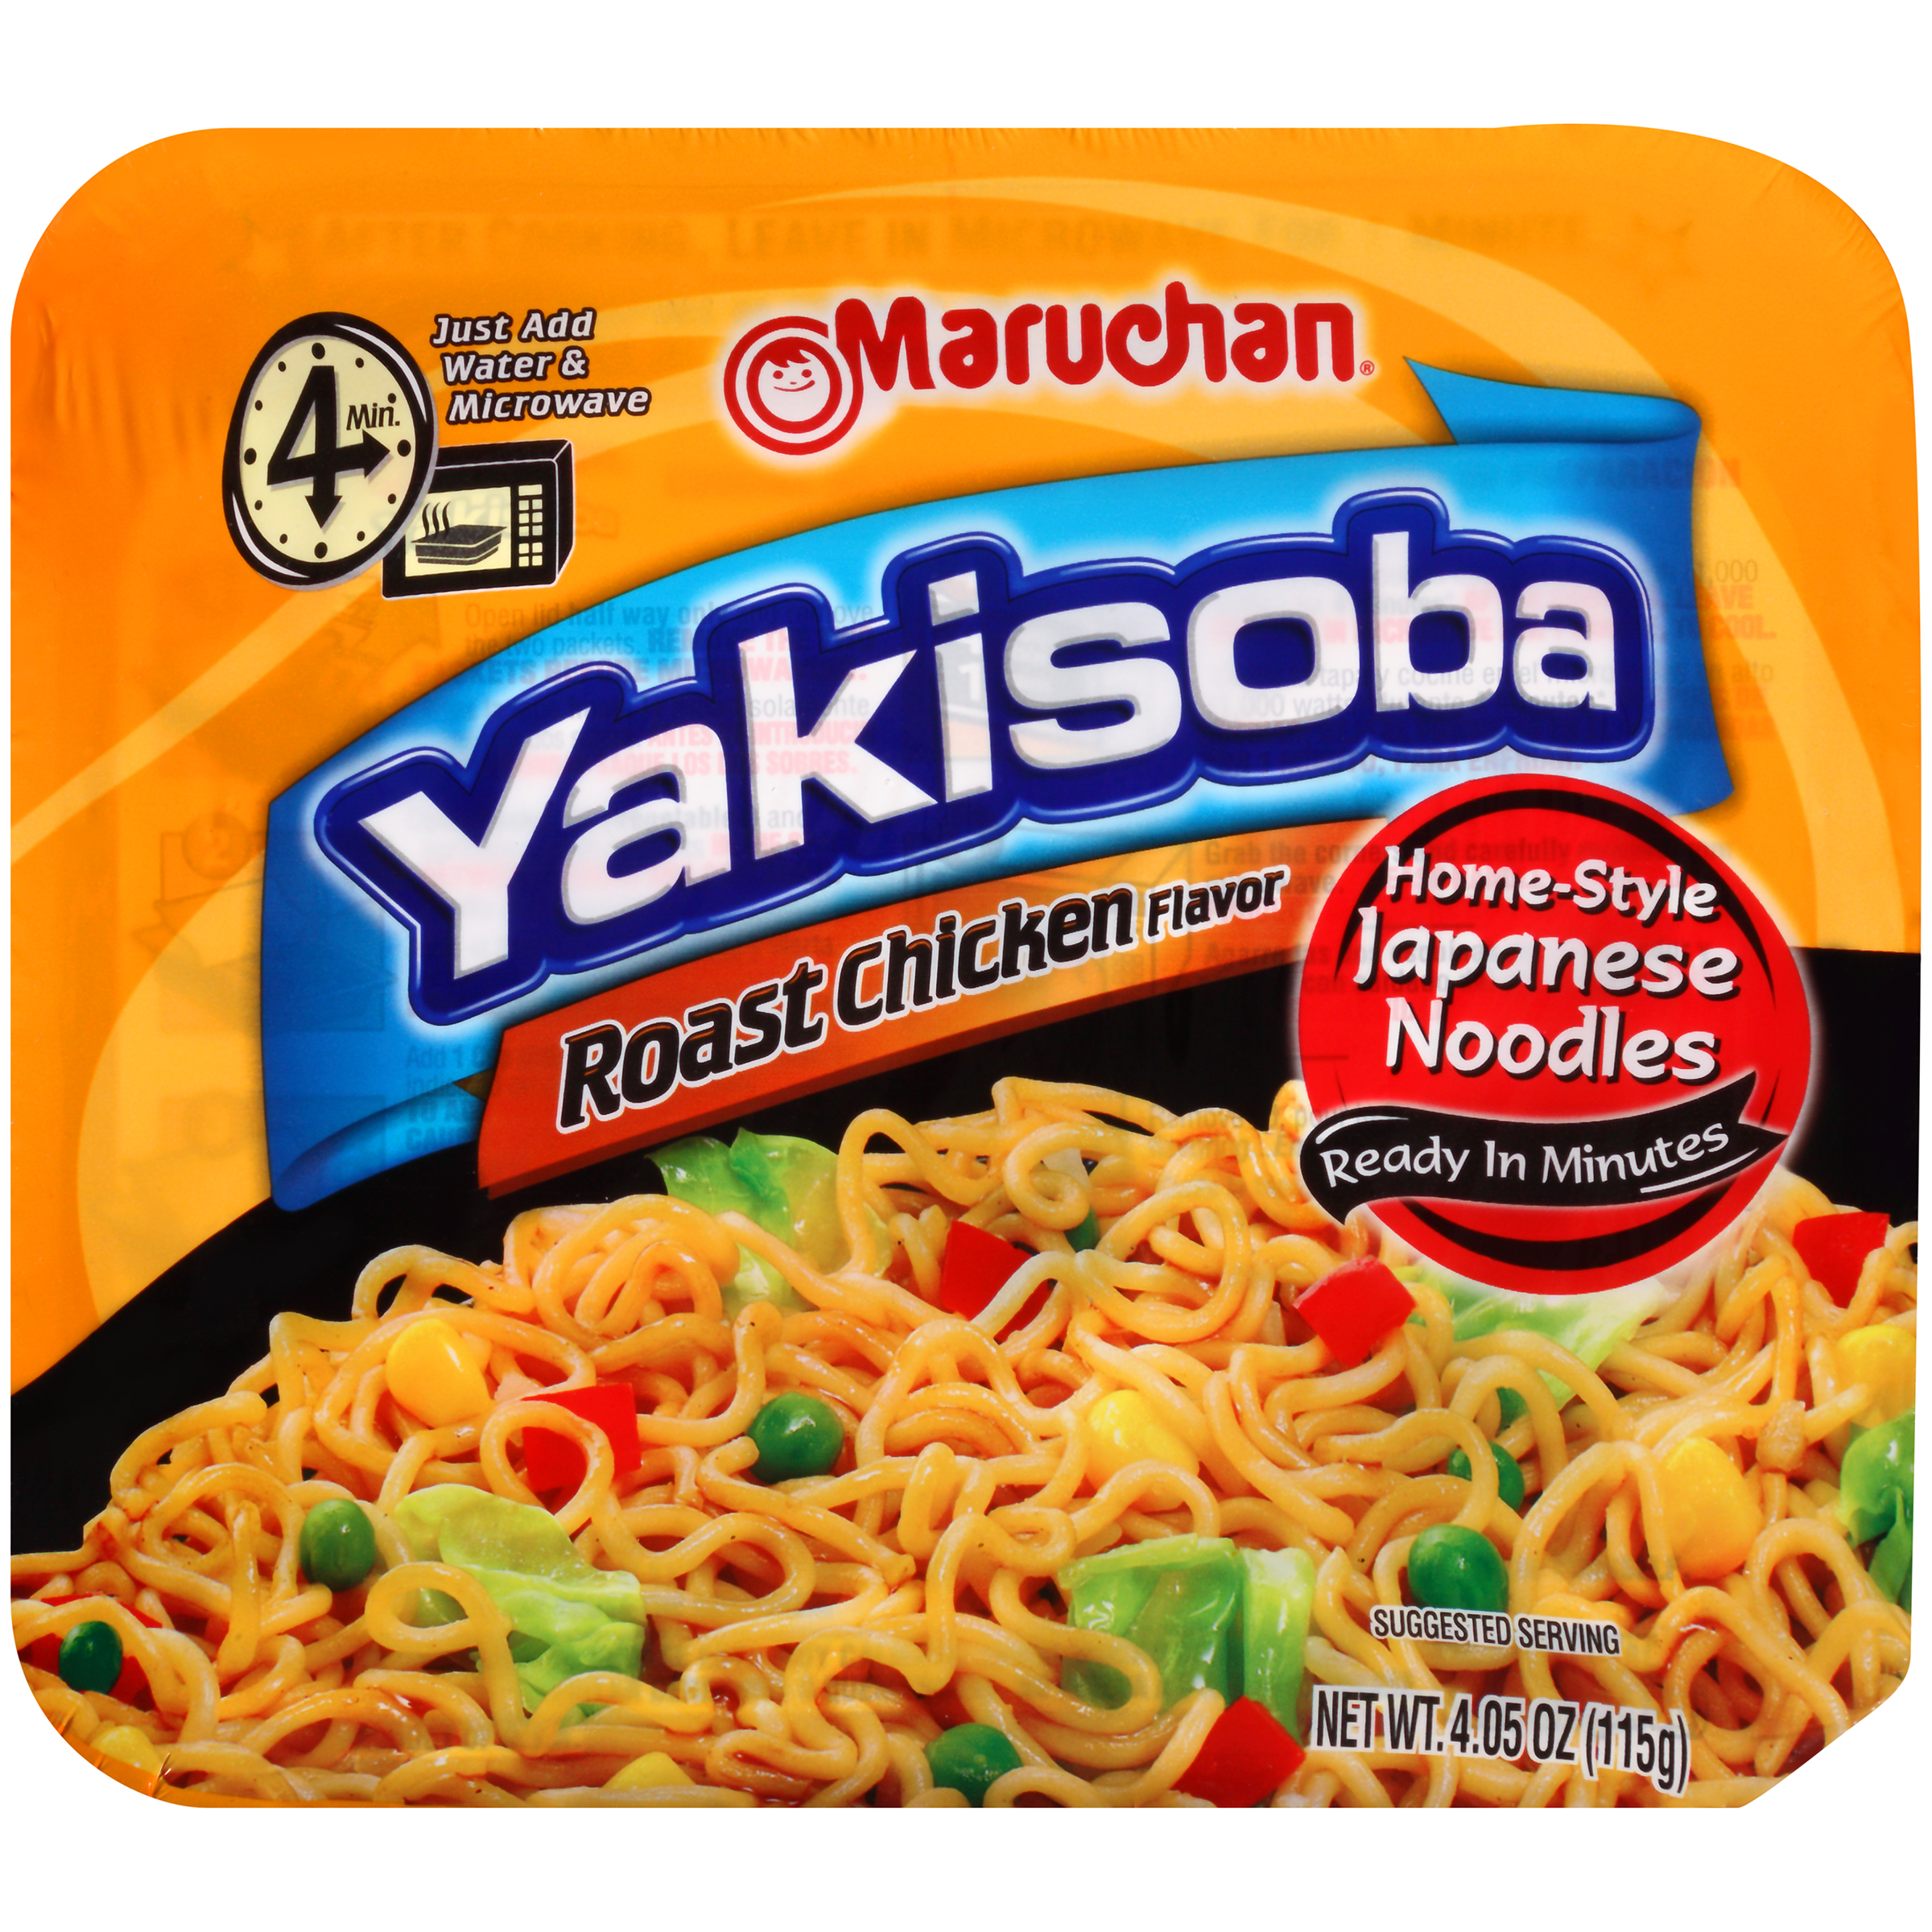 Maruchan�� Yakisoba Roast Chicken Flavor Noodles 4.05 oz. Microwavable Bowl